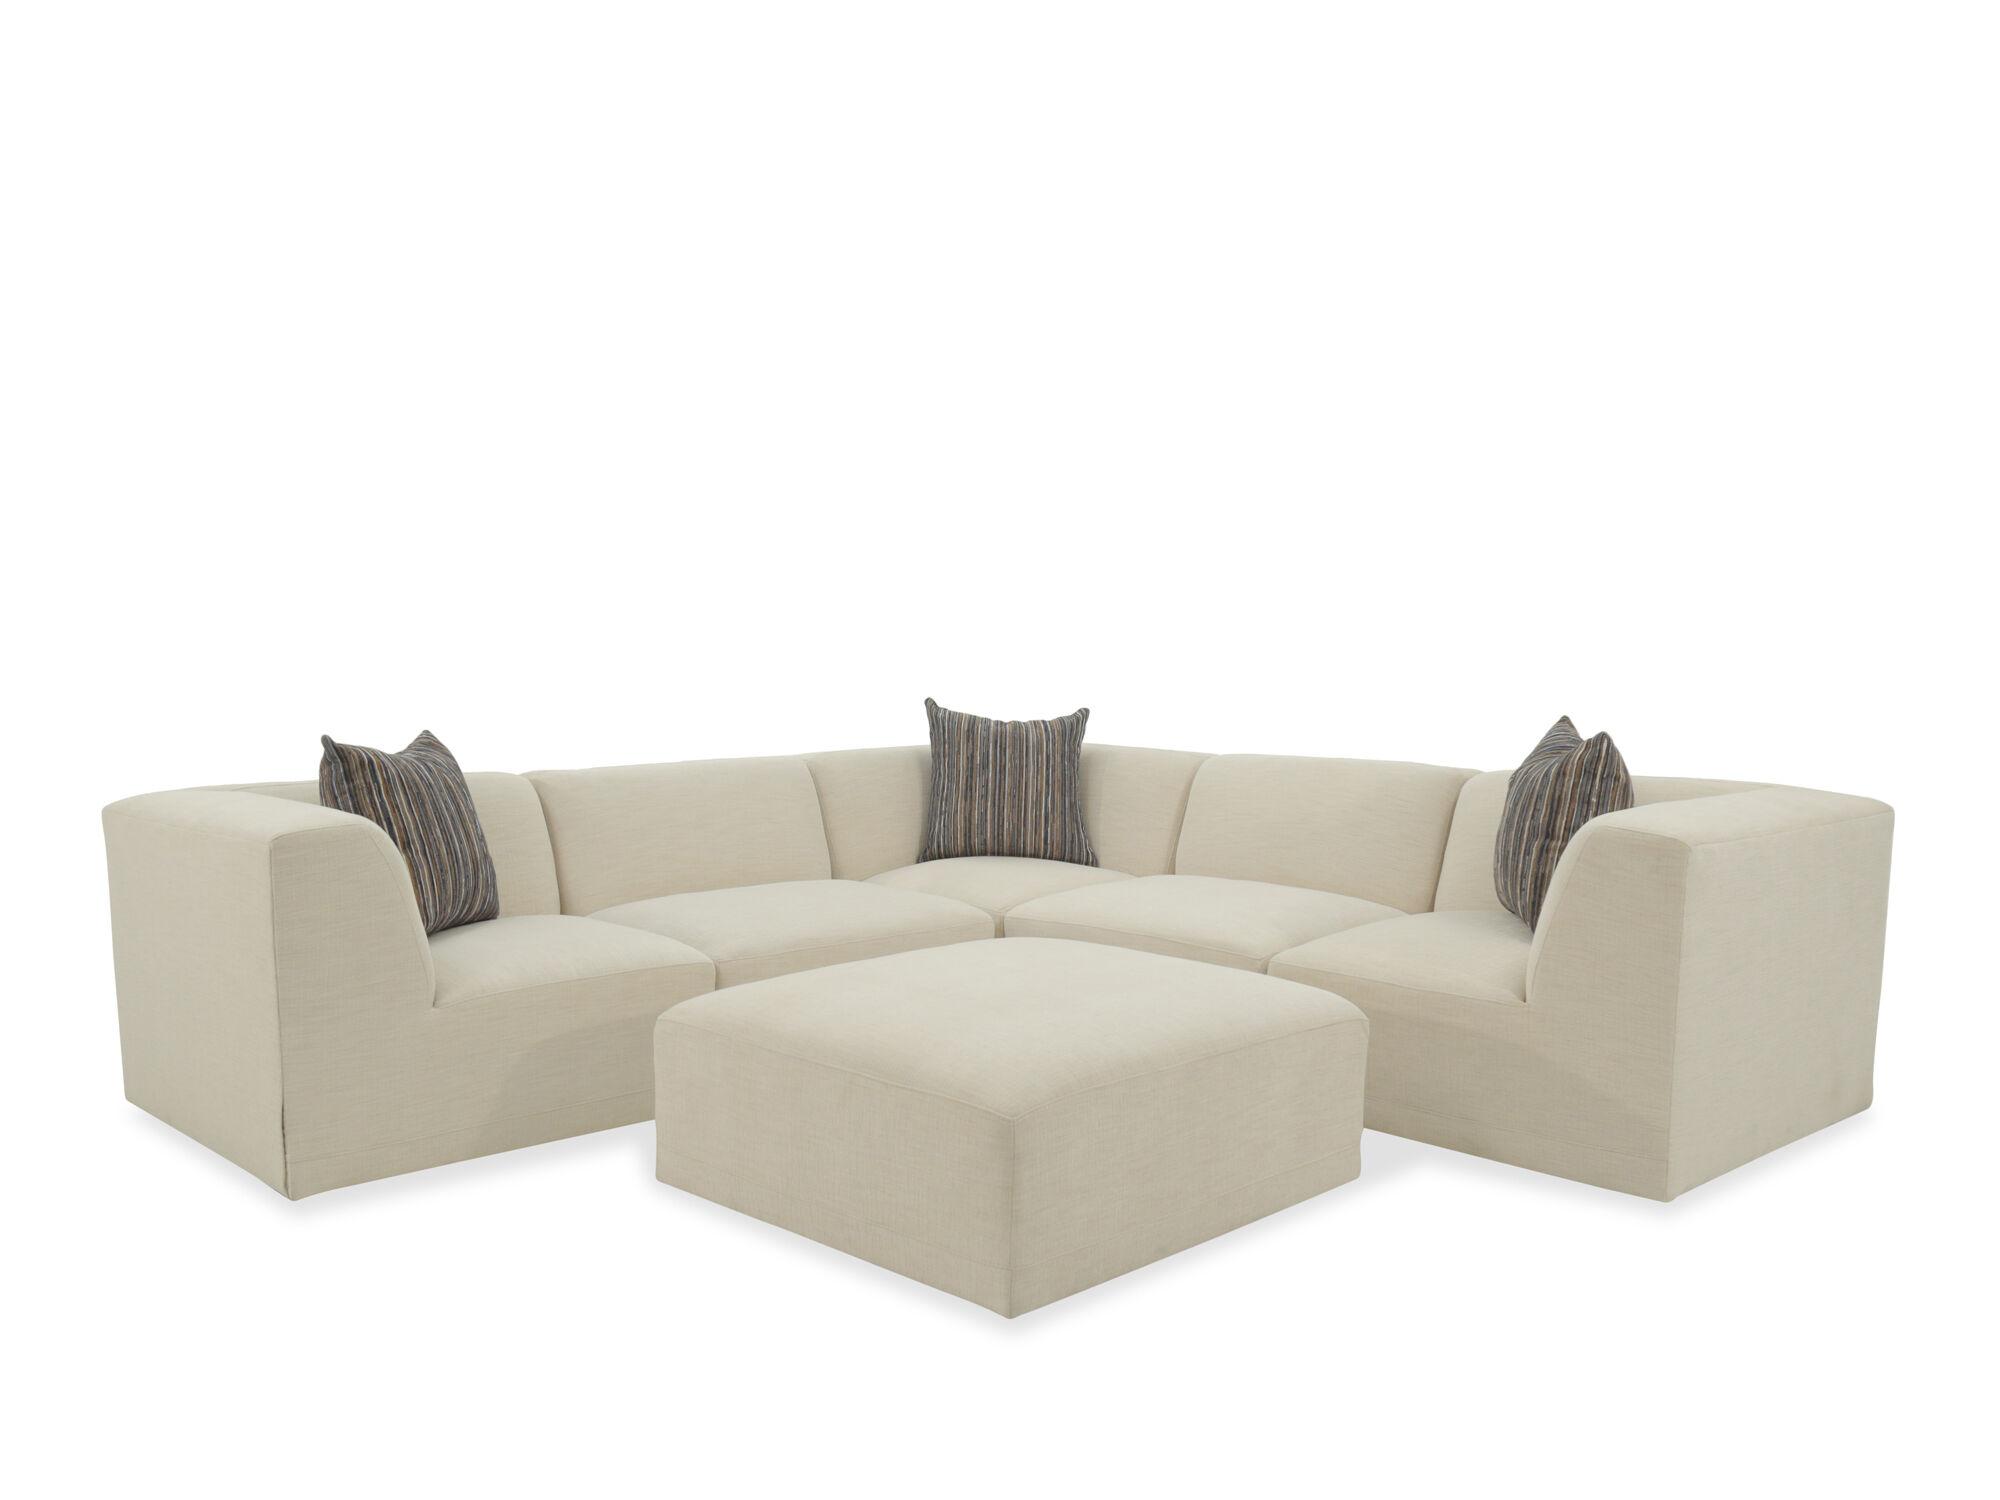 Jonathan Louis Finn Victory Ivory SixPiece Sectional Sofa